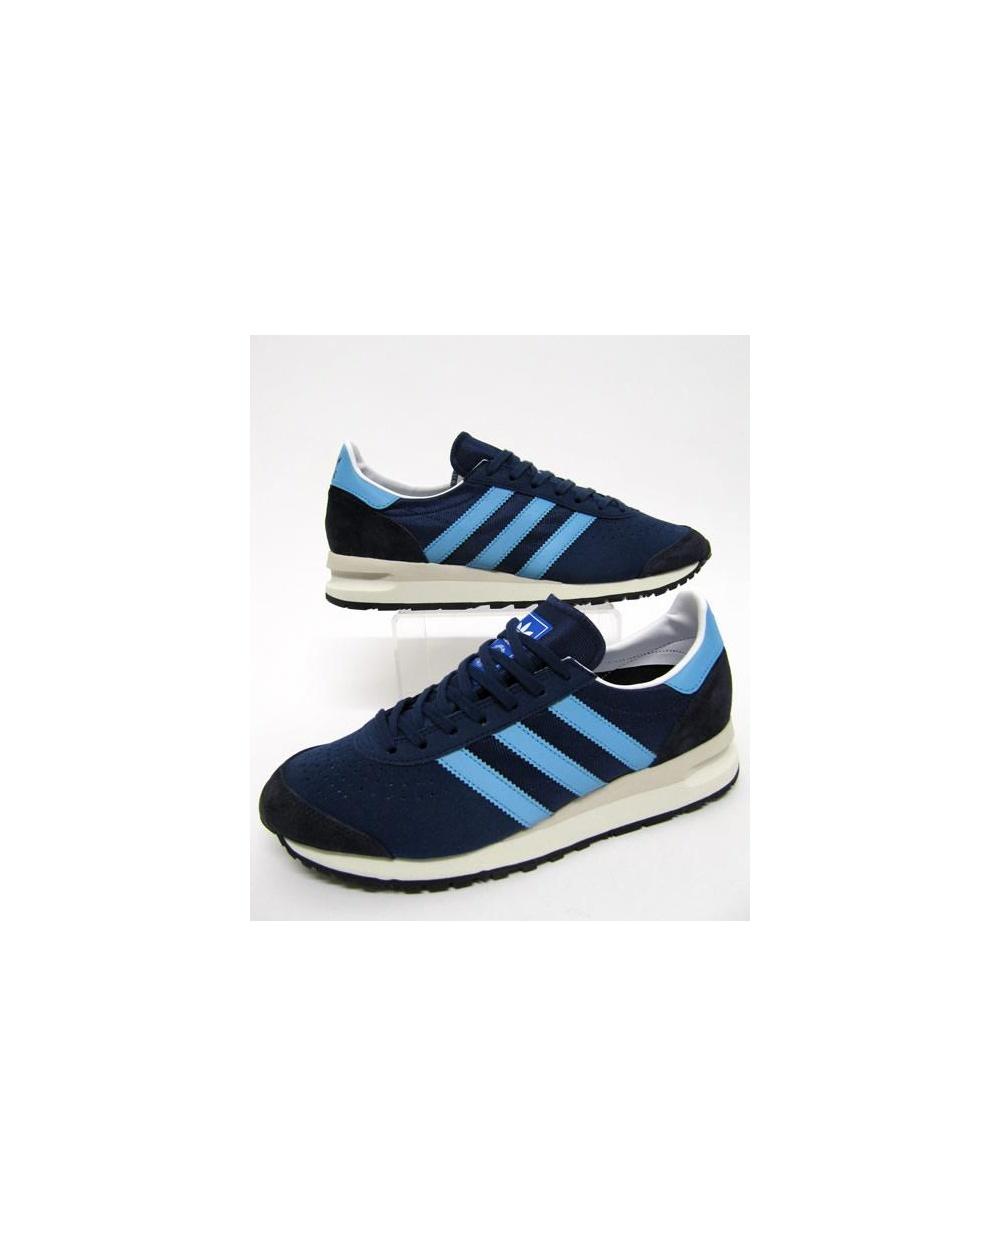 adidas Originals Footwear Marathon 85 Trainers Navy